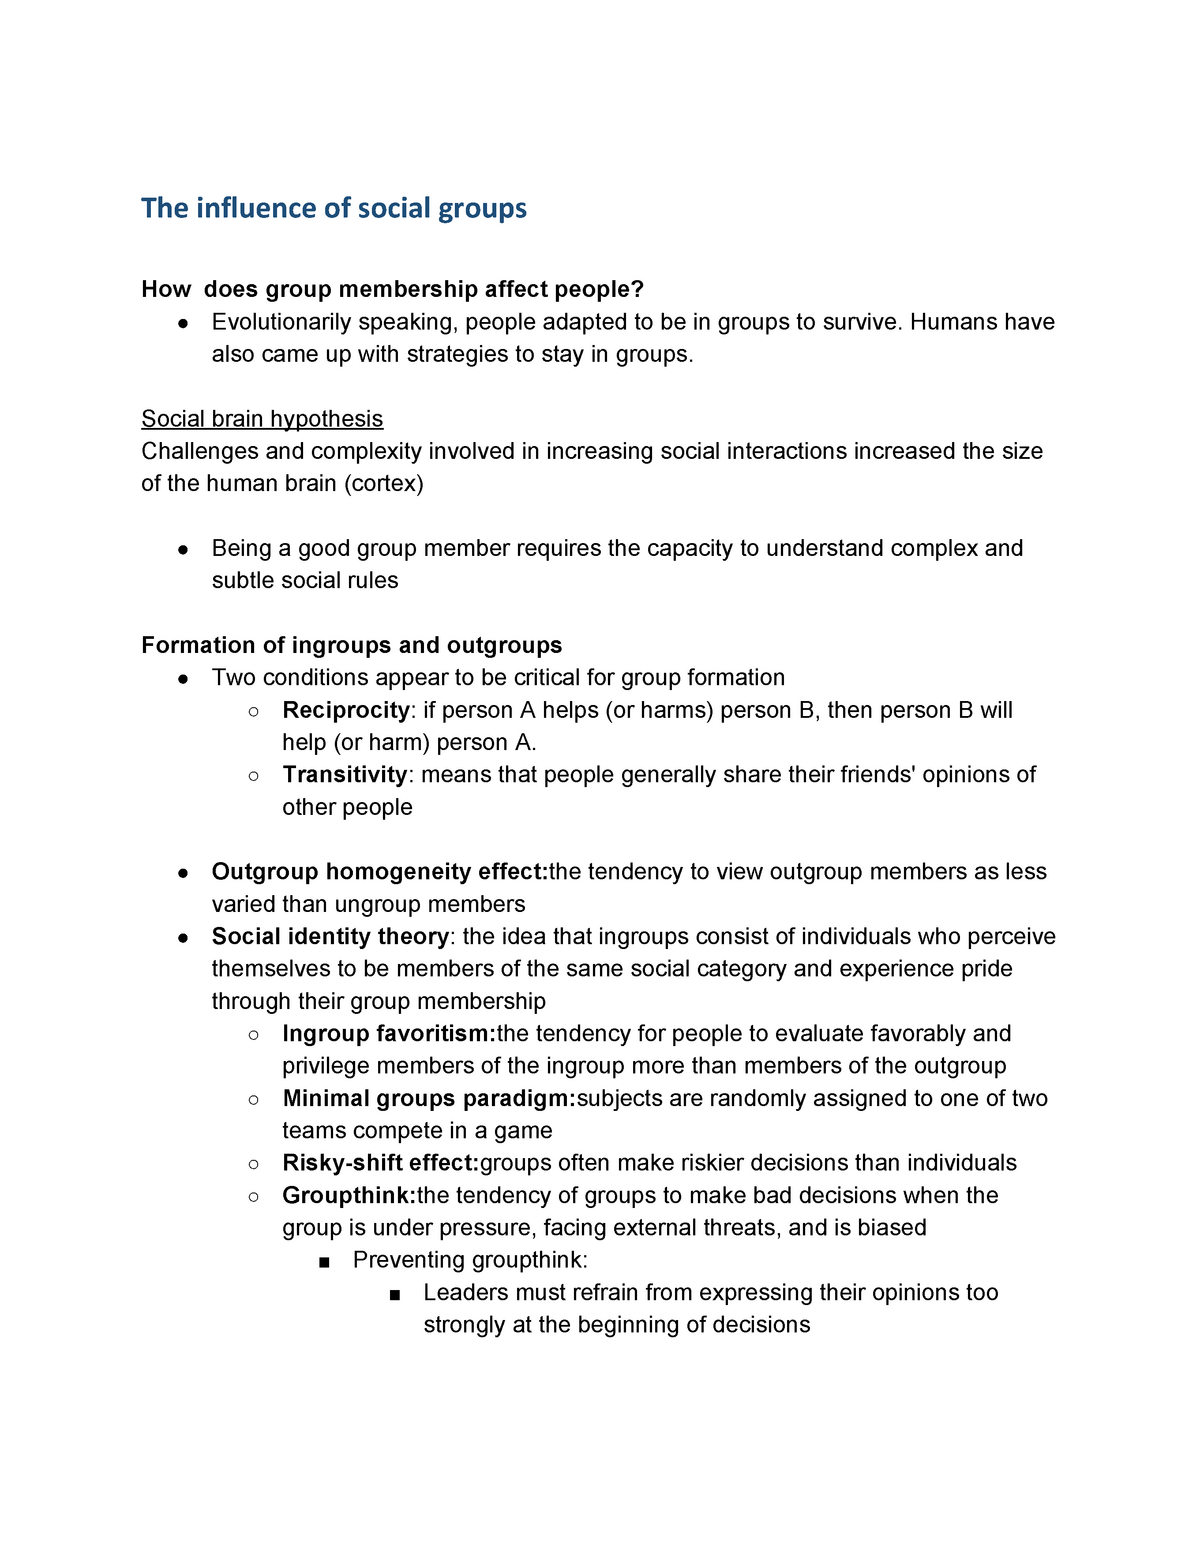 Social psychology part 2 - PSY 202: Mind And Society >2